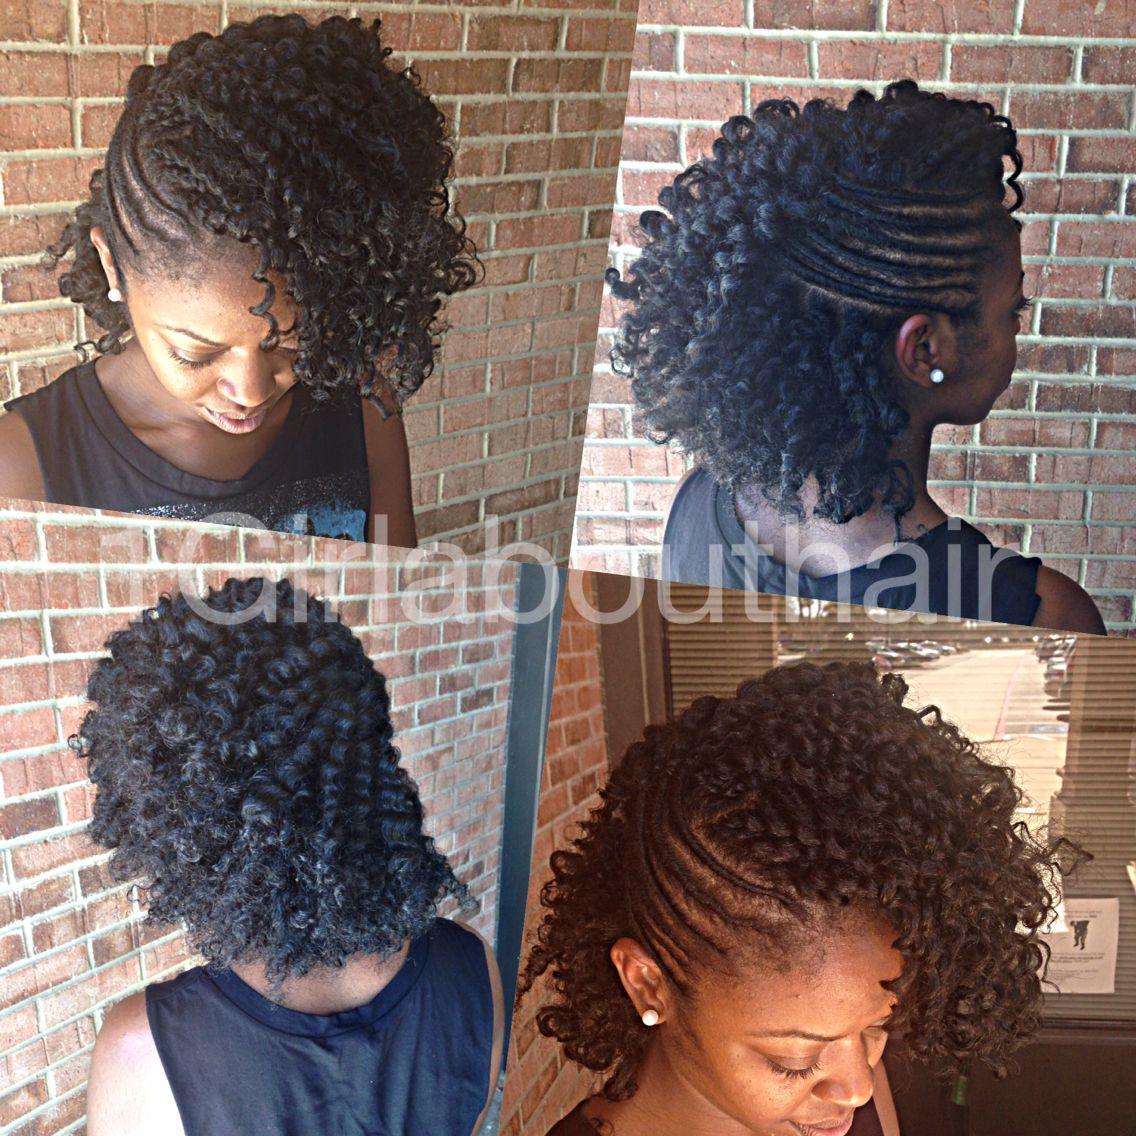 Twist out Naturalhair www.Styleseat.com/Allysonnicole #styleseatdallas #naturalhair